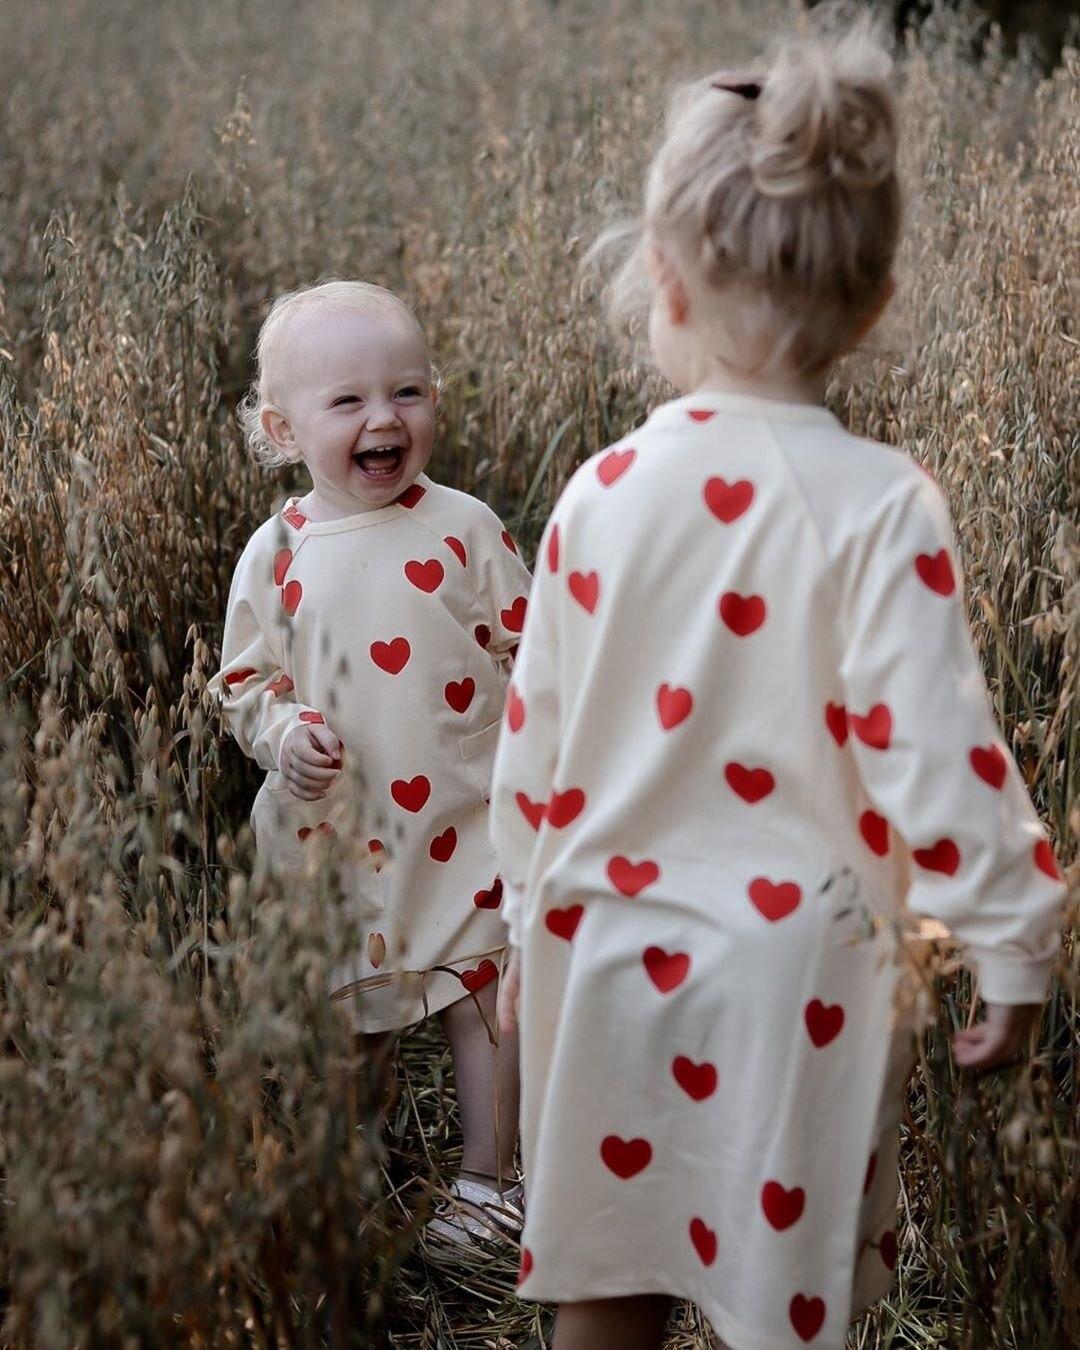 MINI Brand Kids T-shirts 2020 New Autumn Girls Heart Pattern Dress Fall Long Sleeve Cotton Fashion Baby Girl Boys Casual Dresses 5